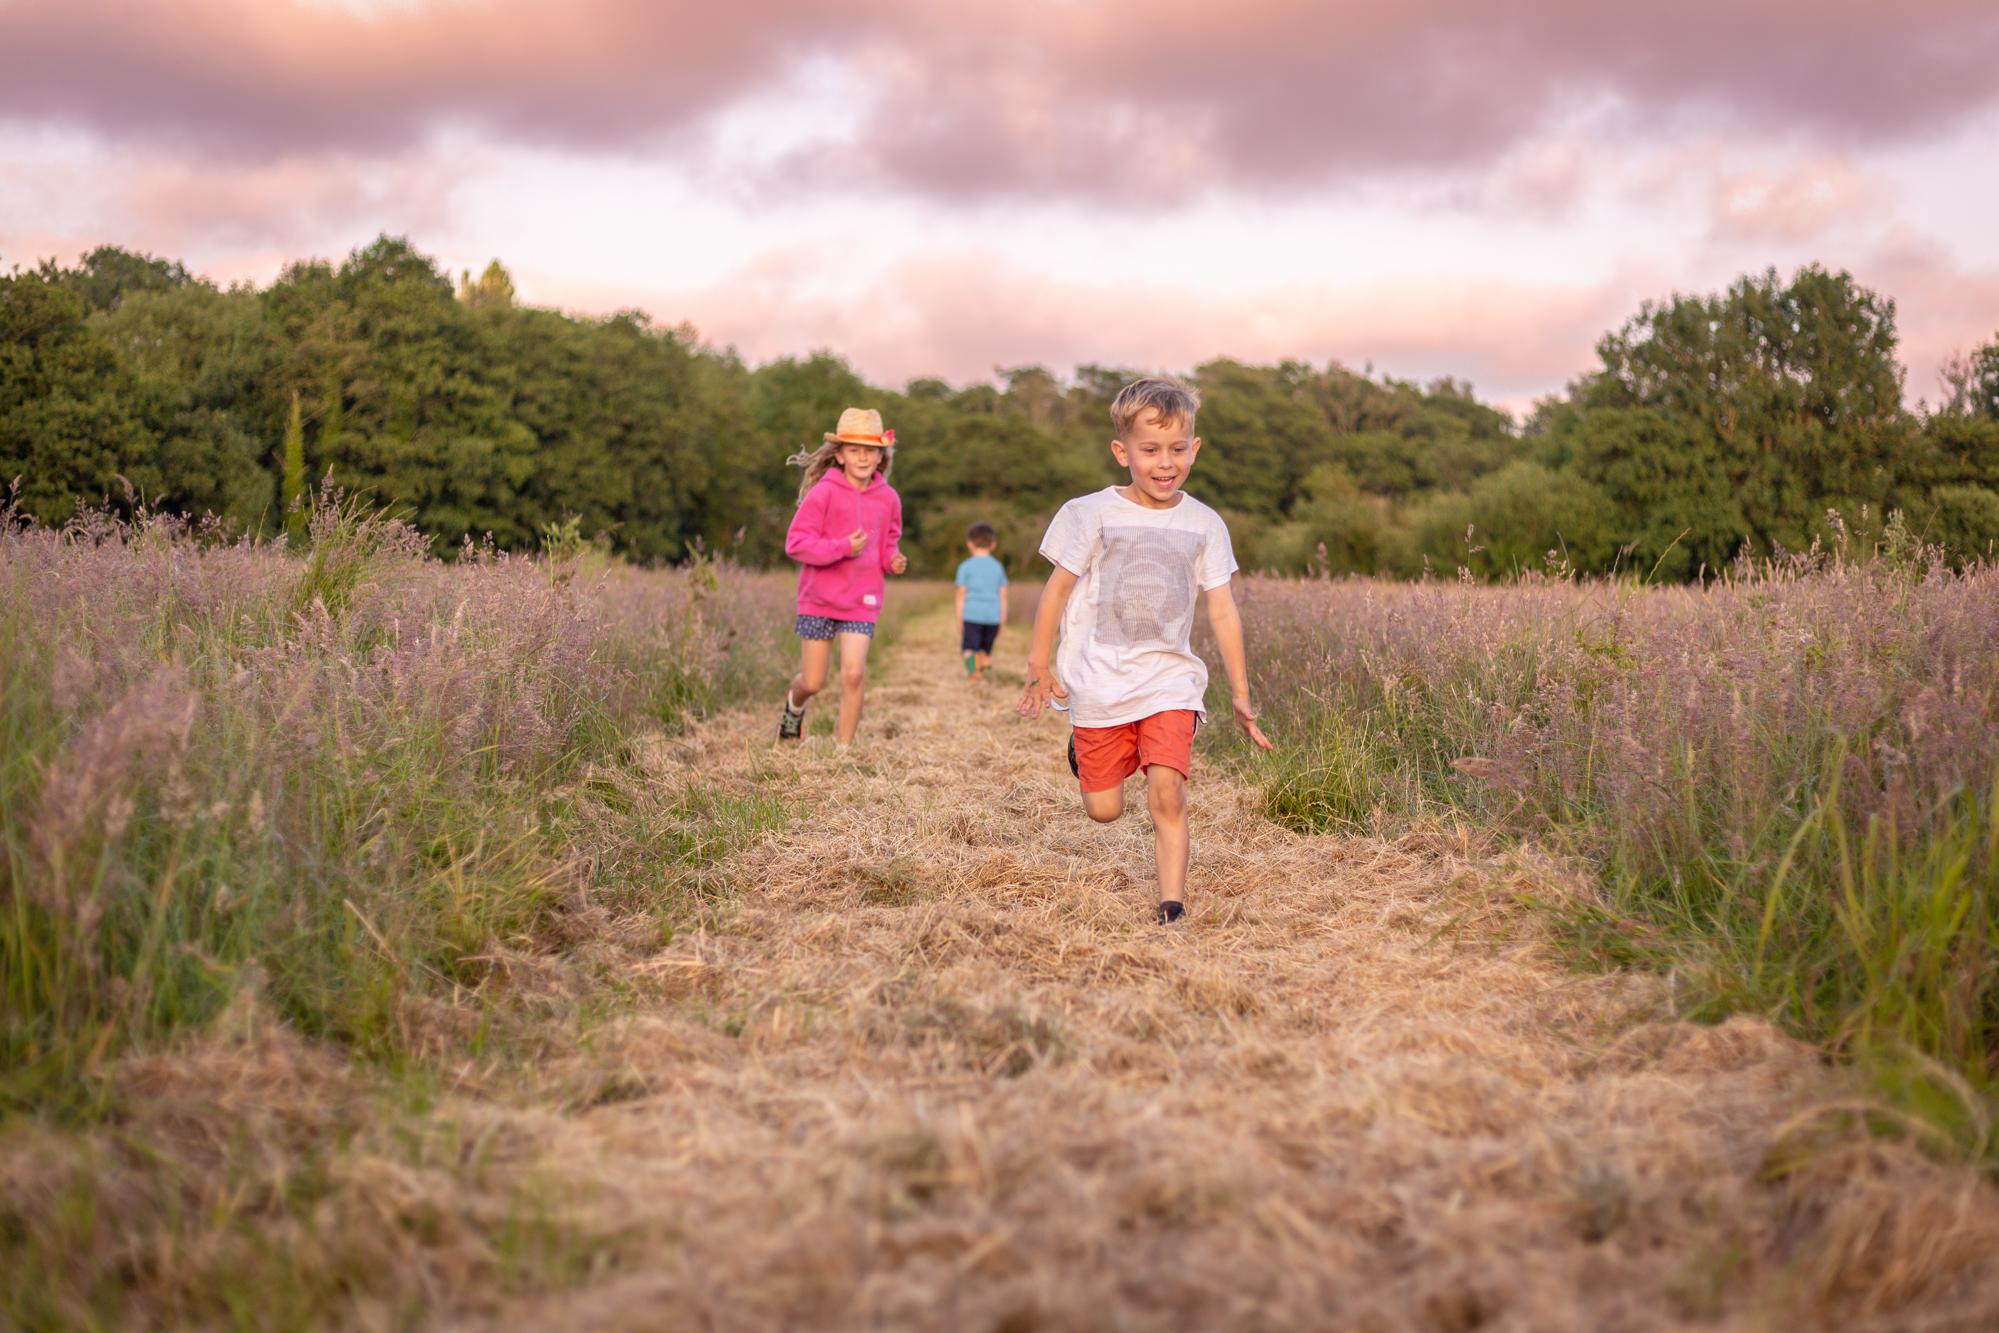 Happisburgh Camping – Campsites near Happisburgh, Norfolk